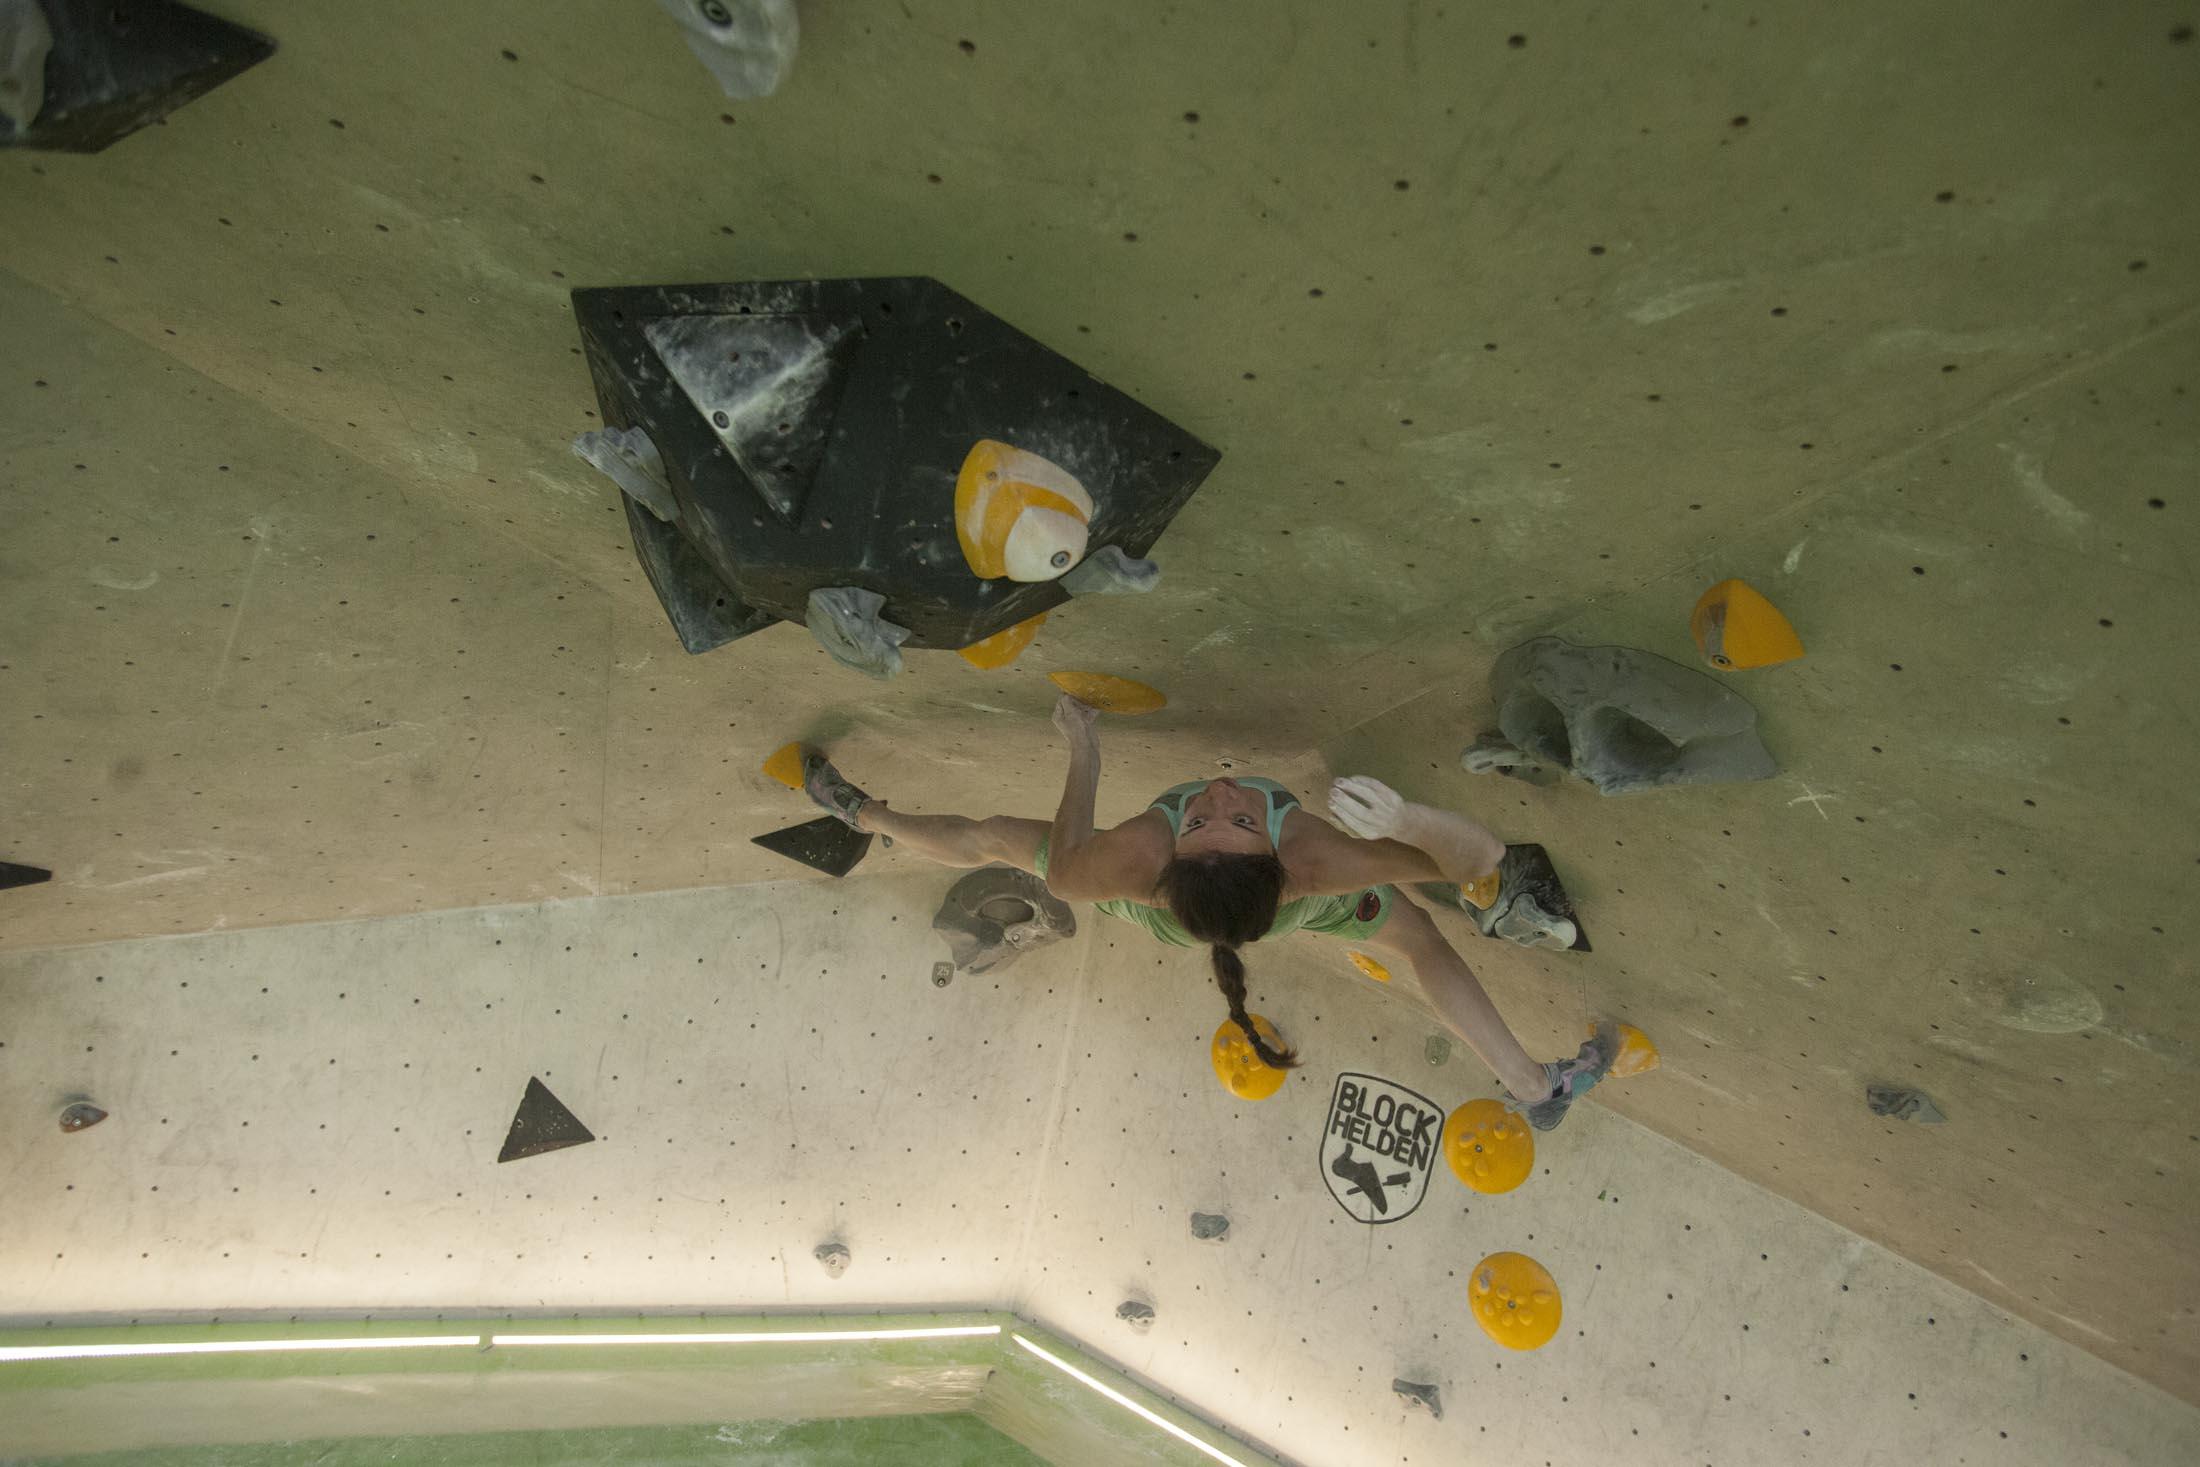 Juliane Wurm, internationaler bouldercup Frankenjura, BLOCKHELDEN Erlangen, Bergfreunde.de, Mammut07092016027